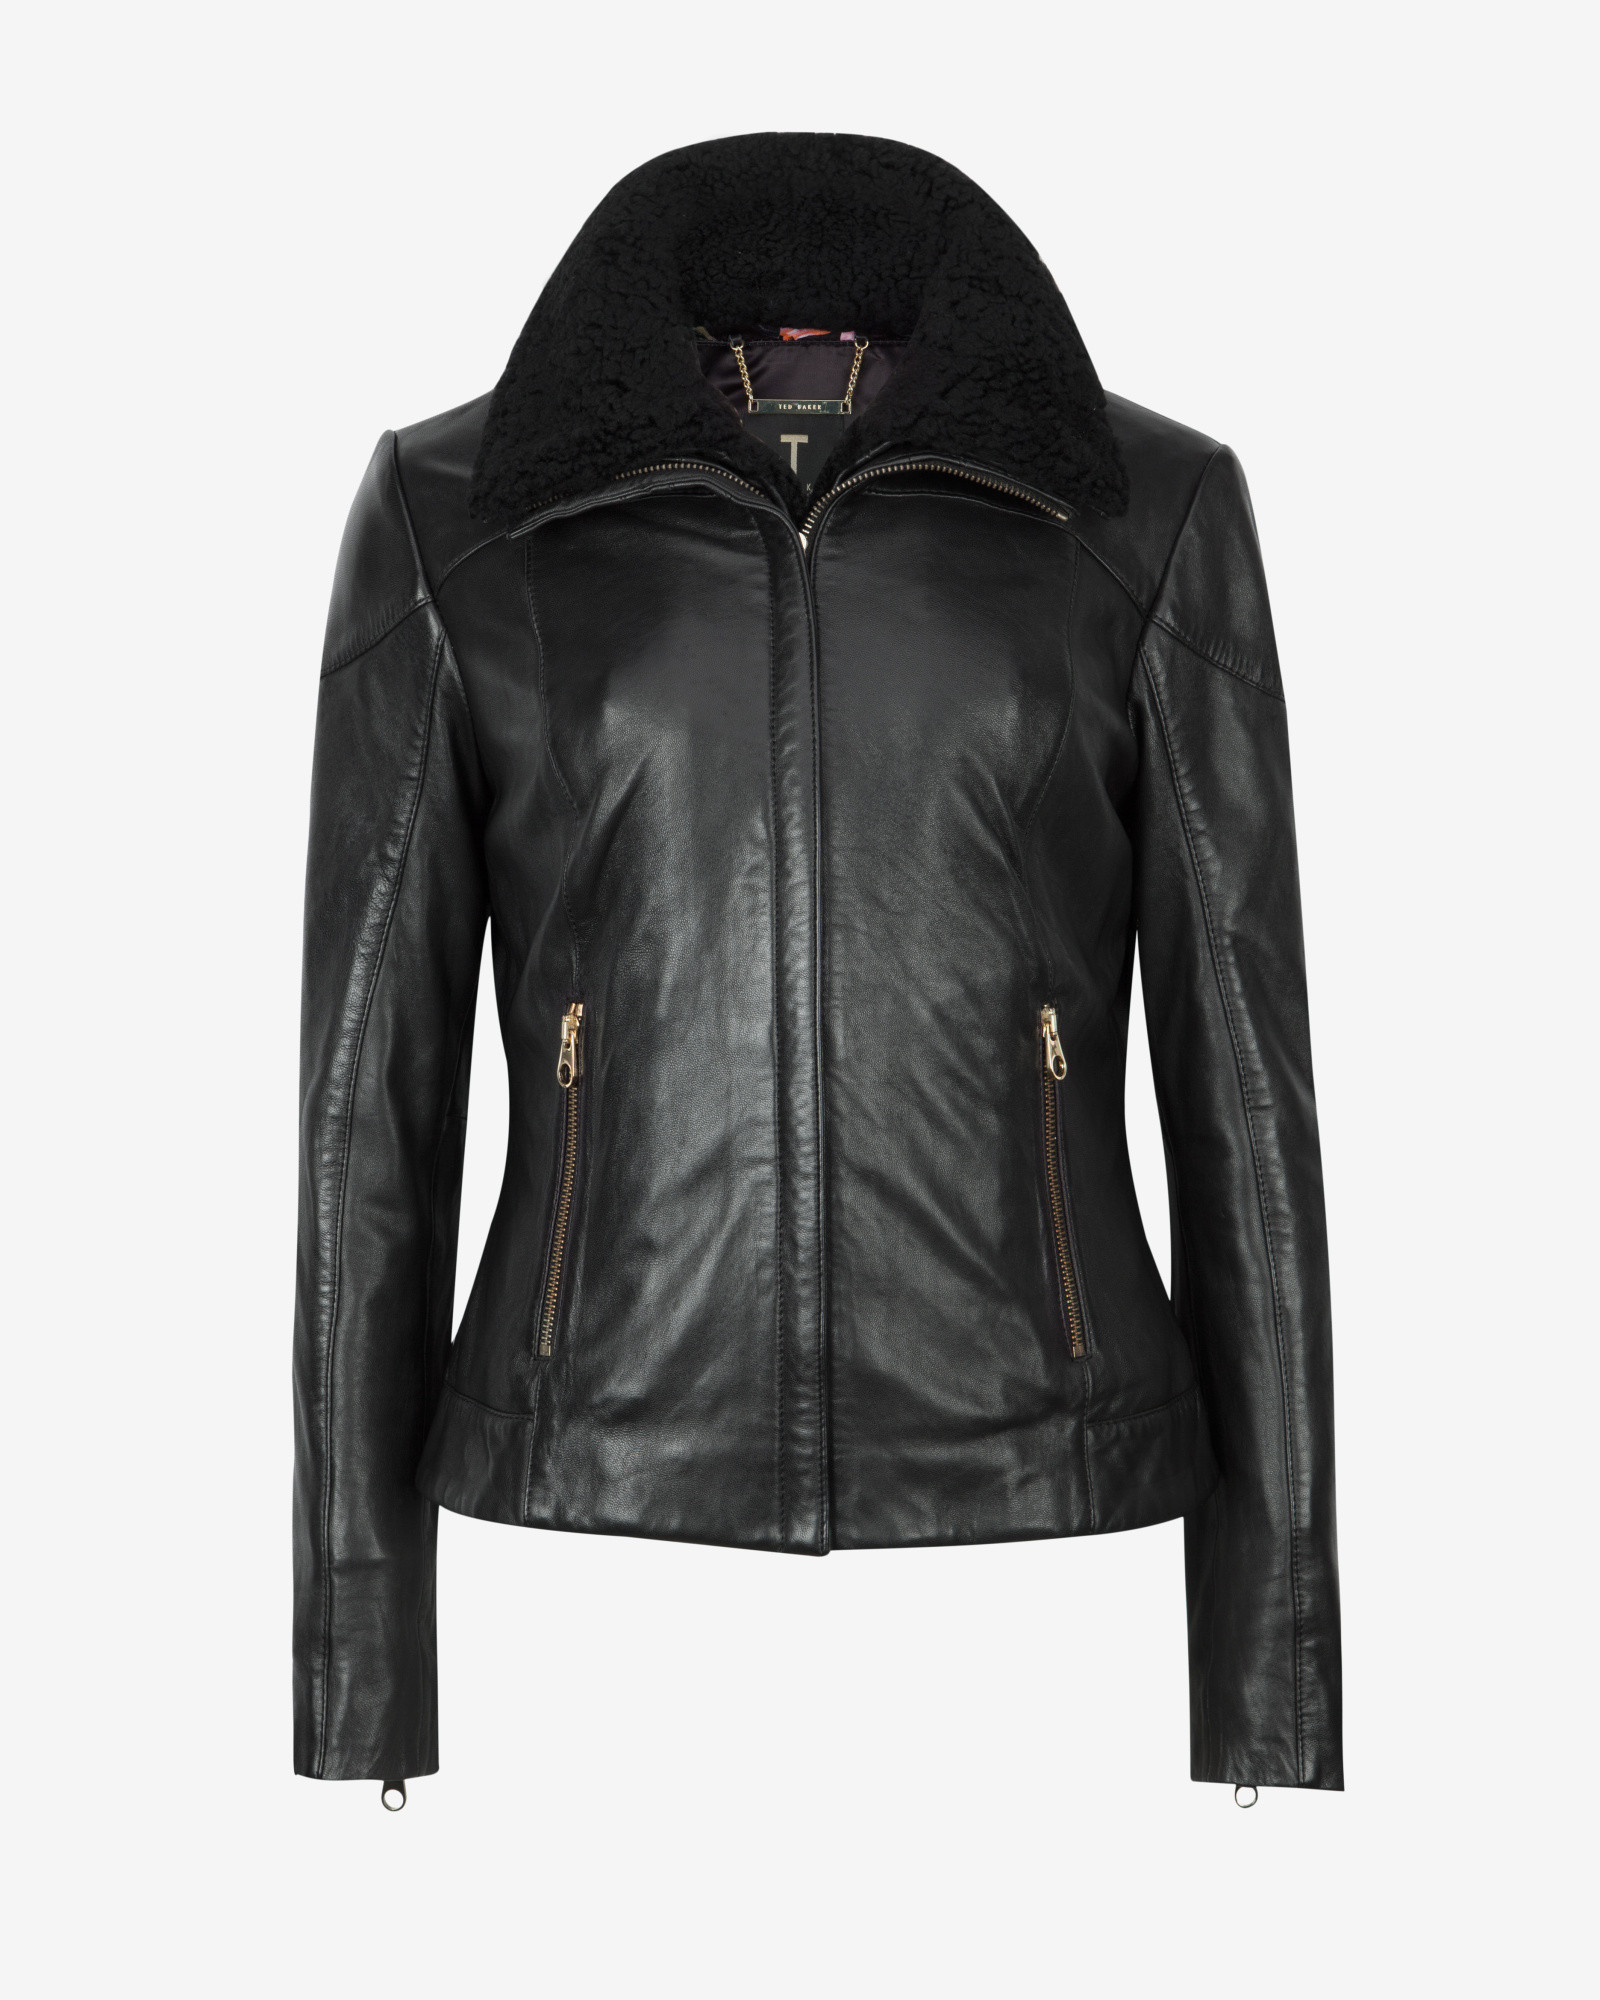 Ted baker leather jacket sale